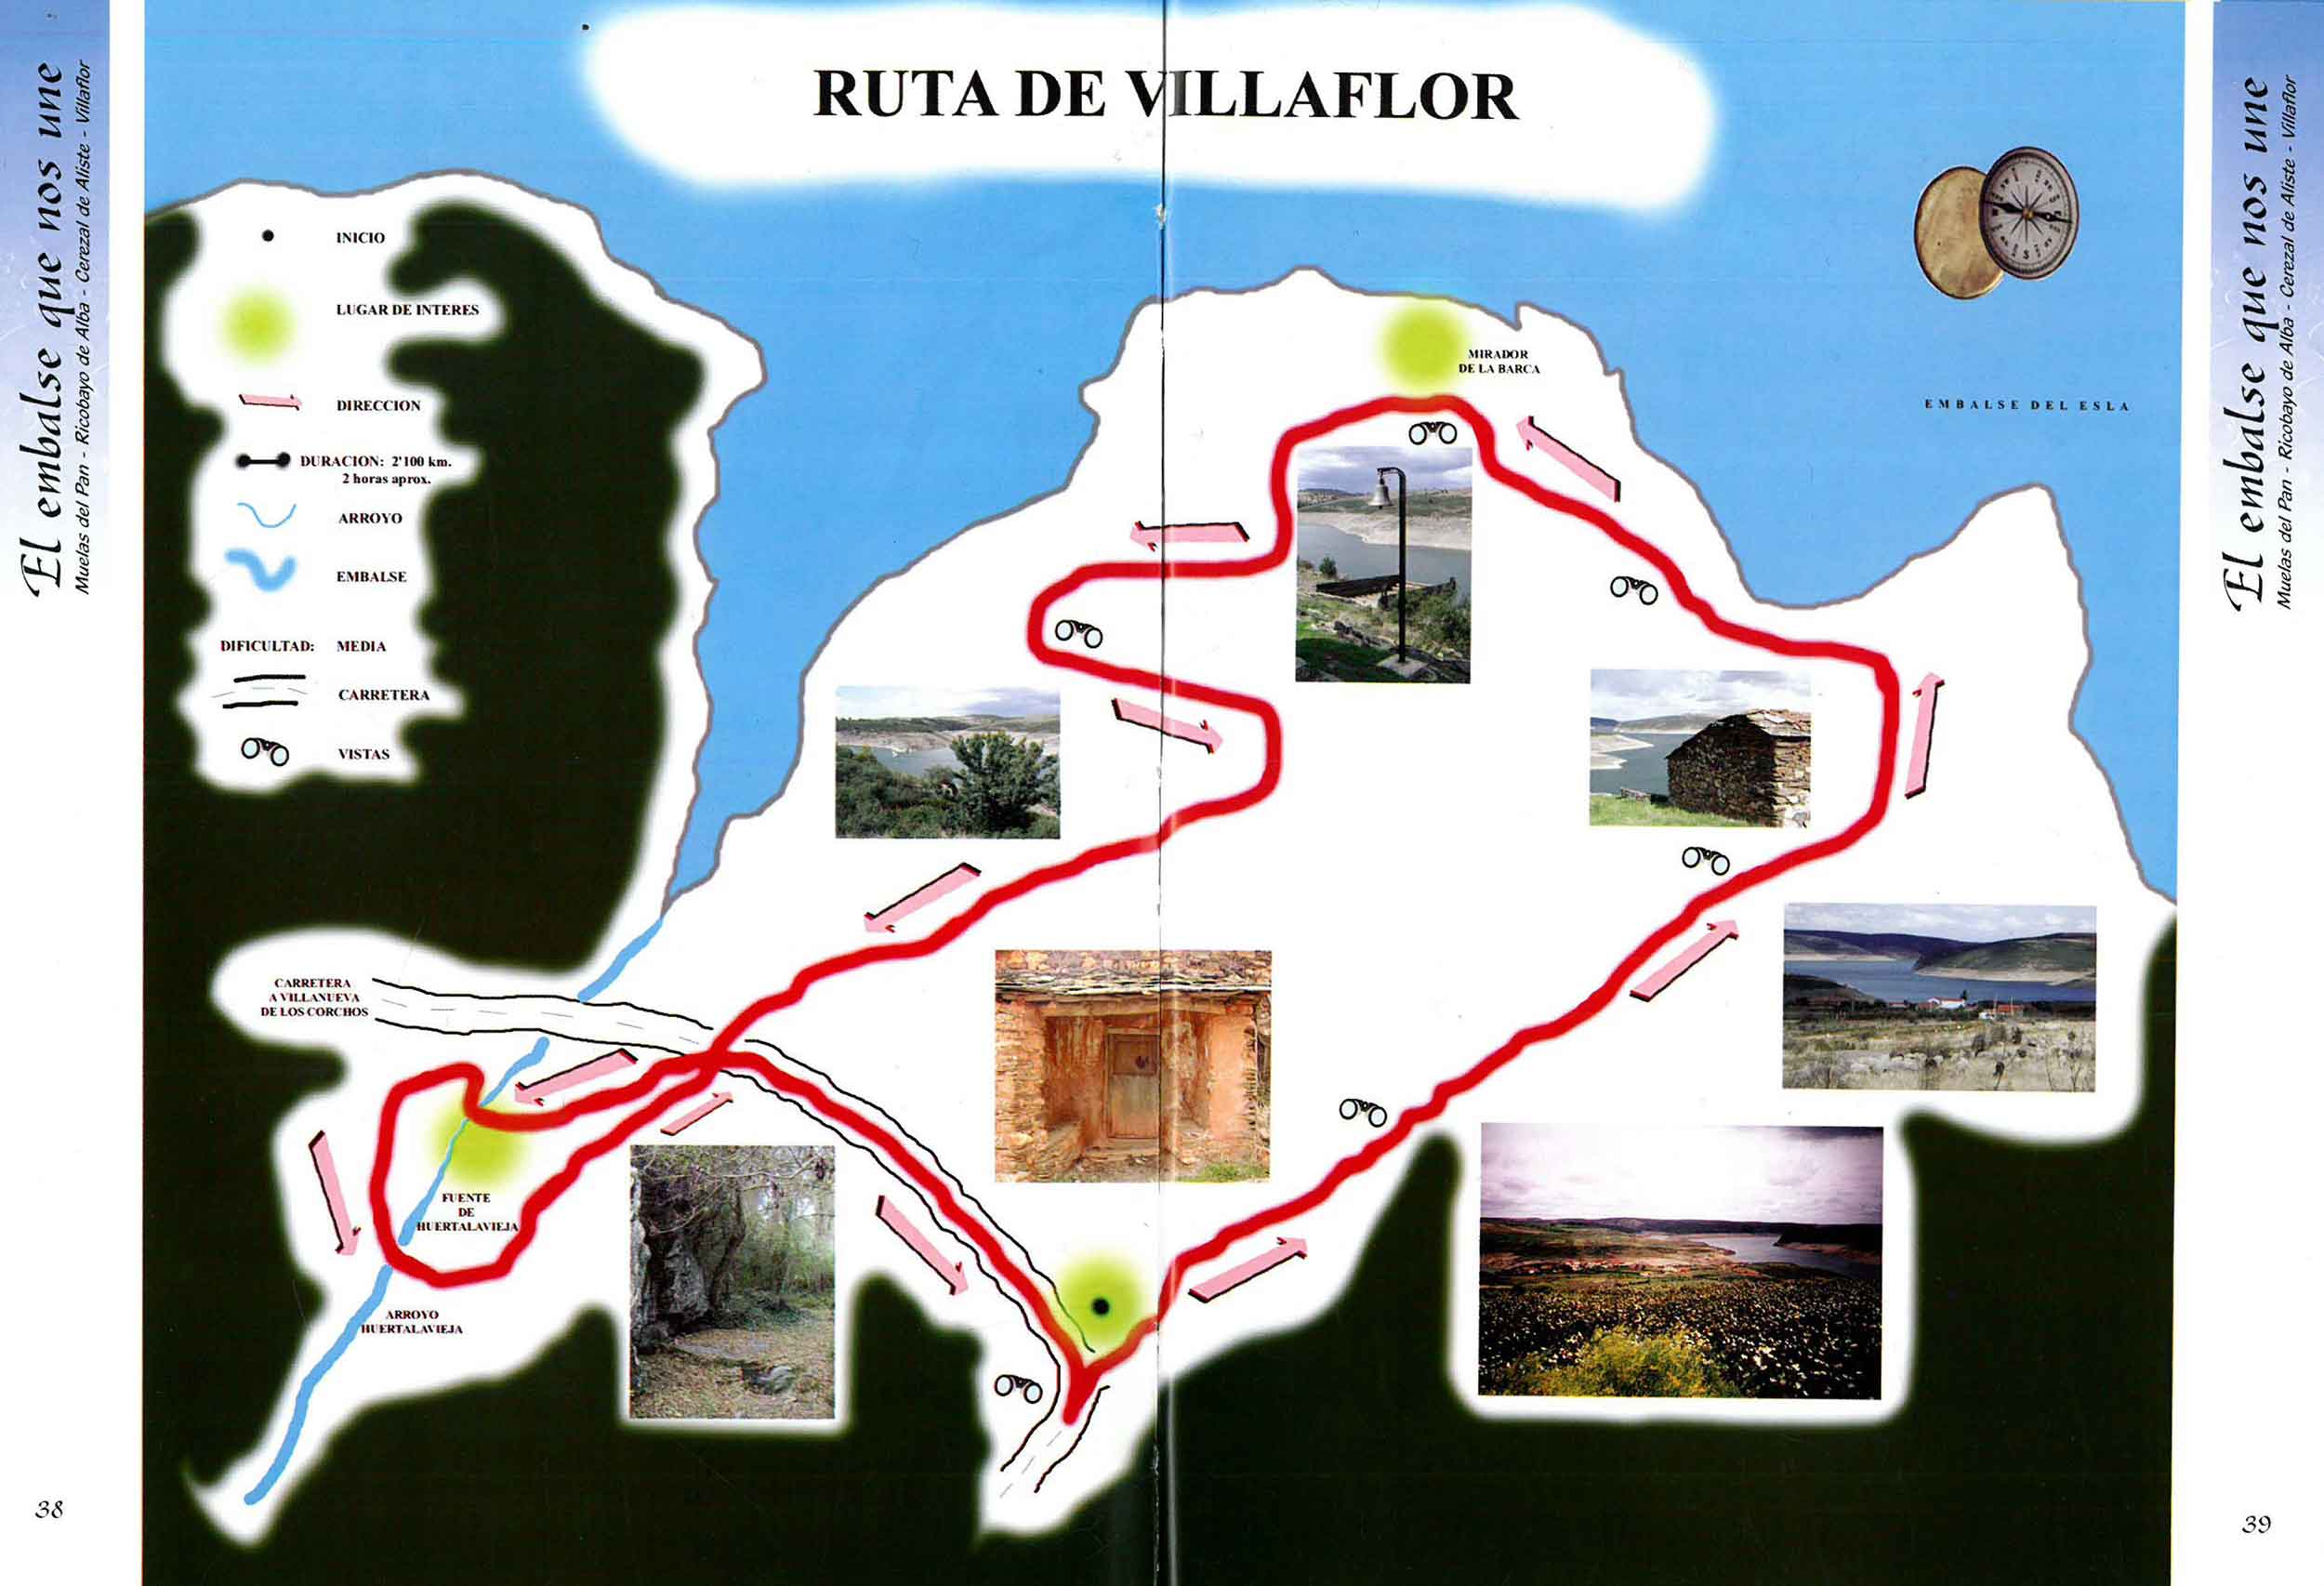 plano ruta de villaflor